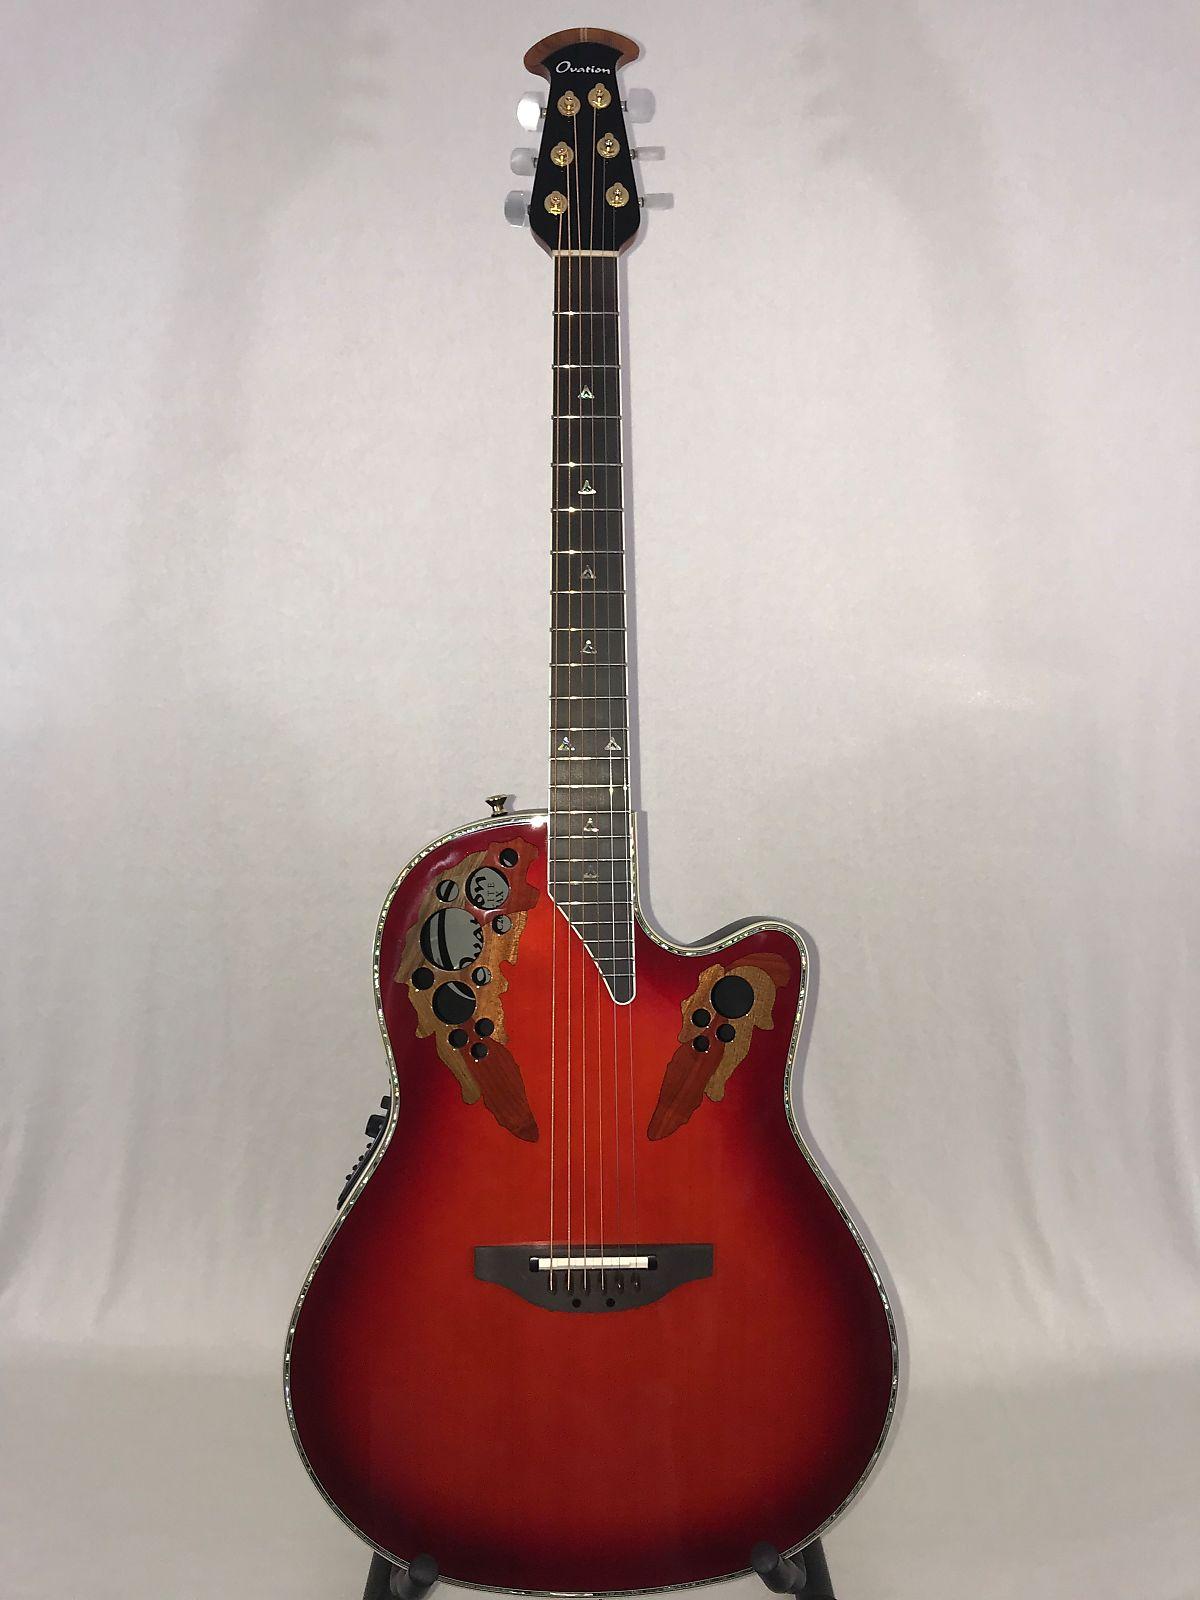 Guitars & Basses Musical Instruments & Gear Ovation Custom Elite C2078 Ax-rtd Deep Contour Guitar Red Tear Drop Acoustic-ele